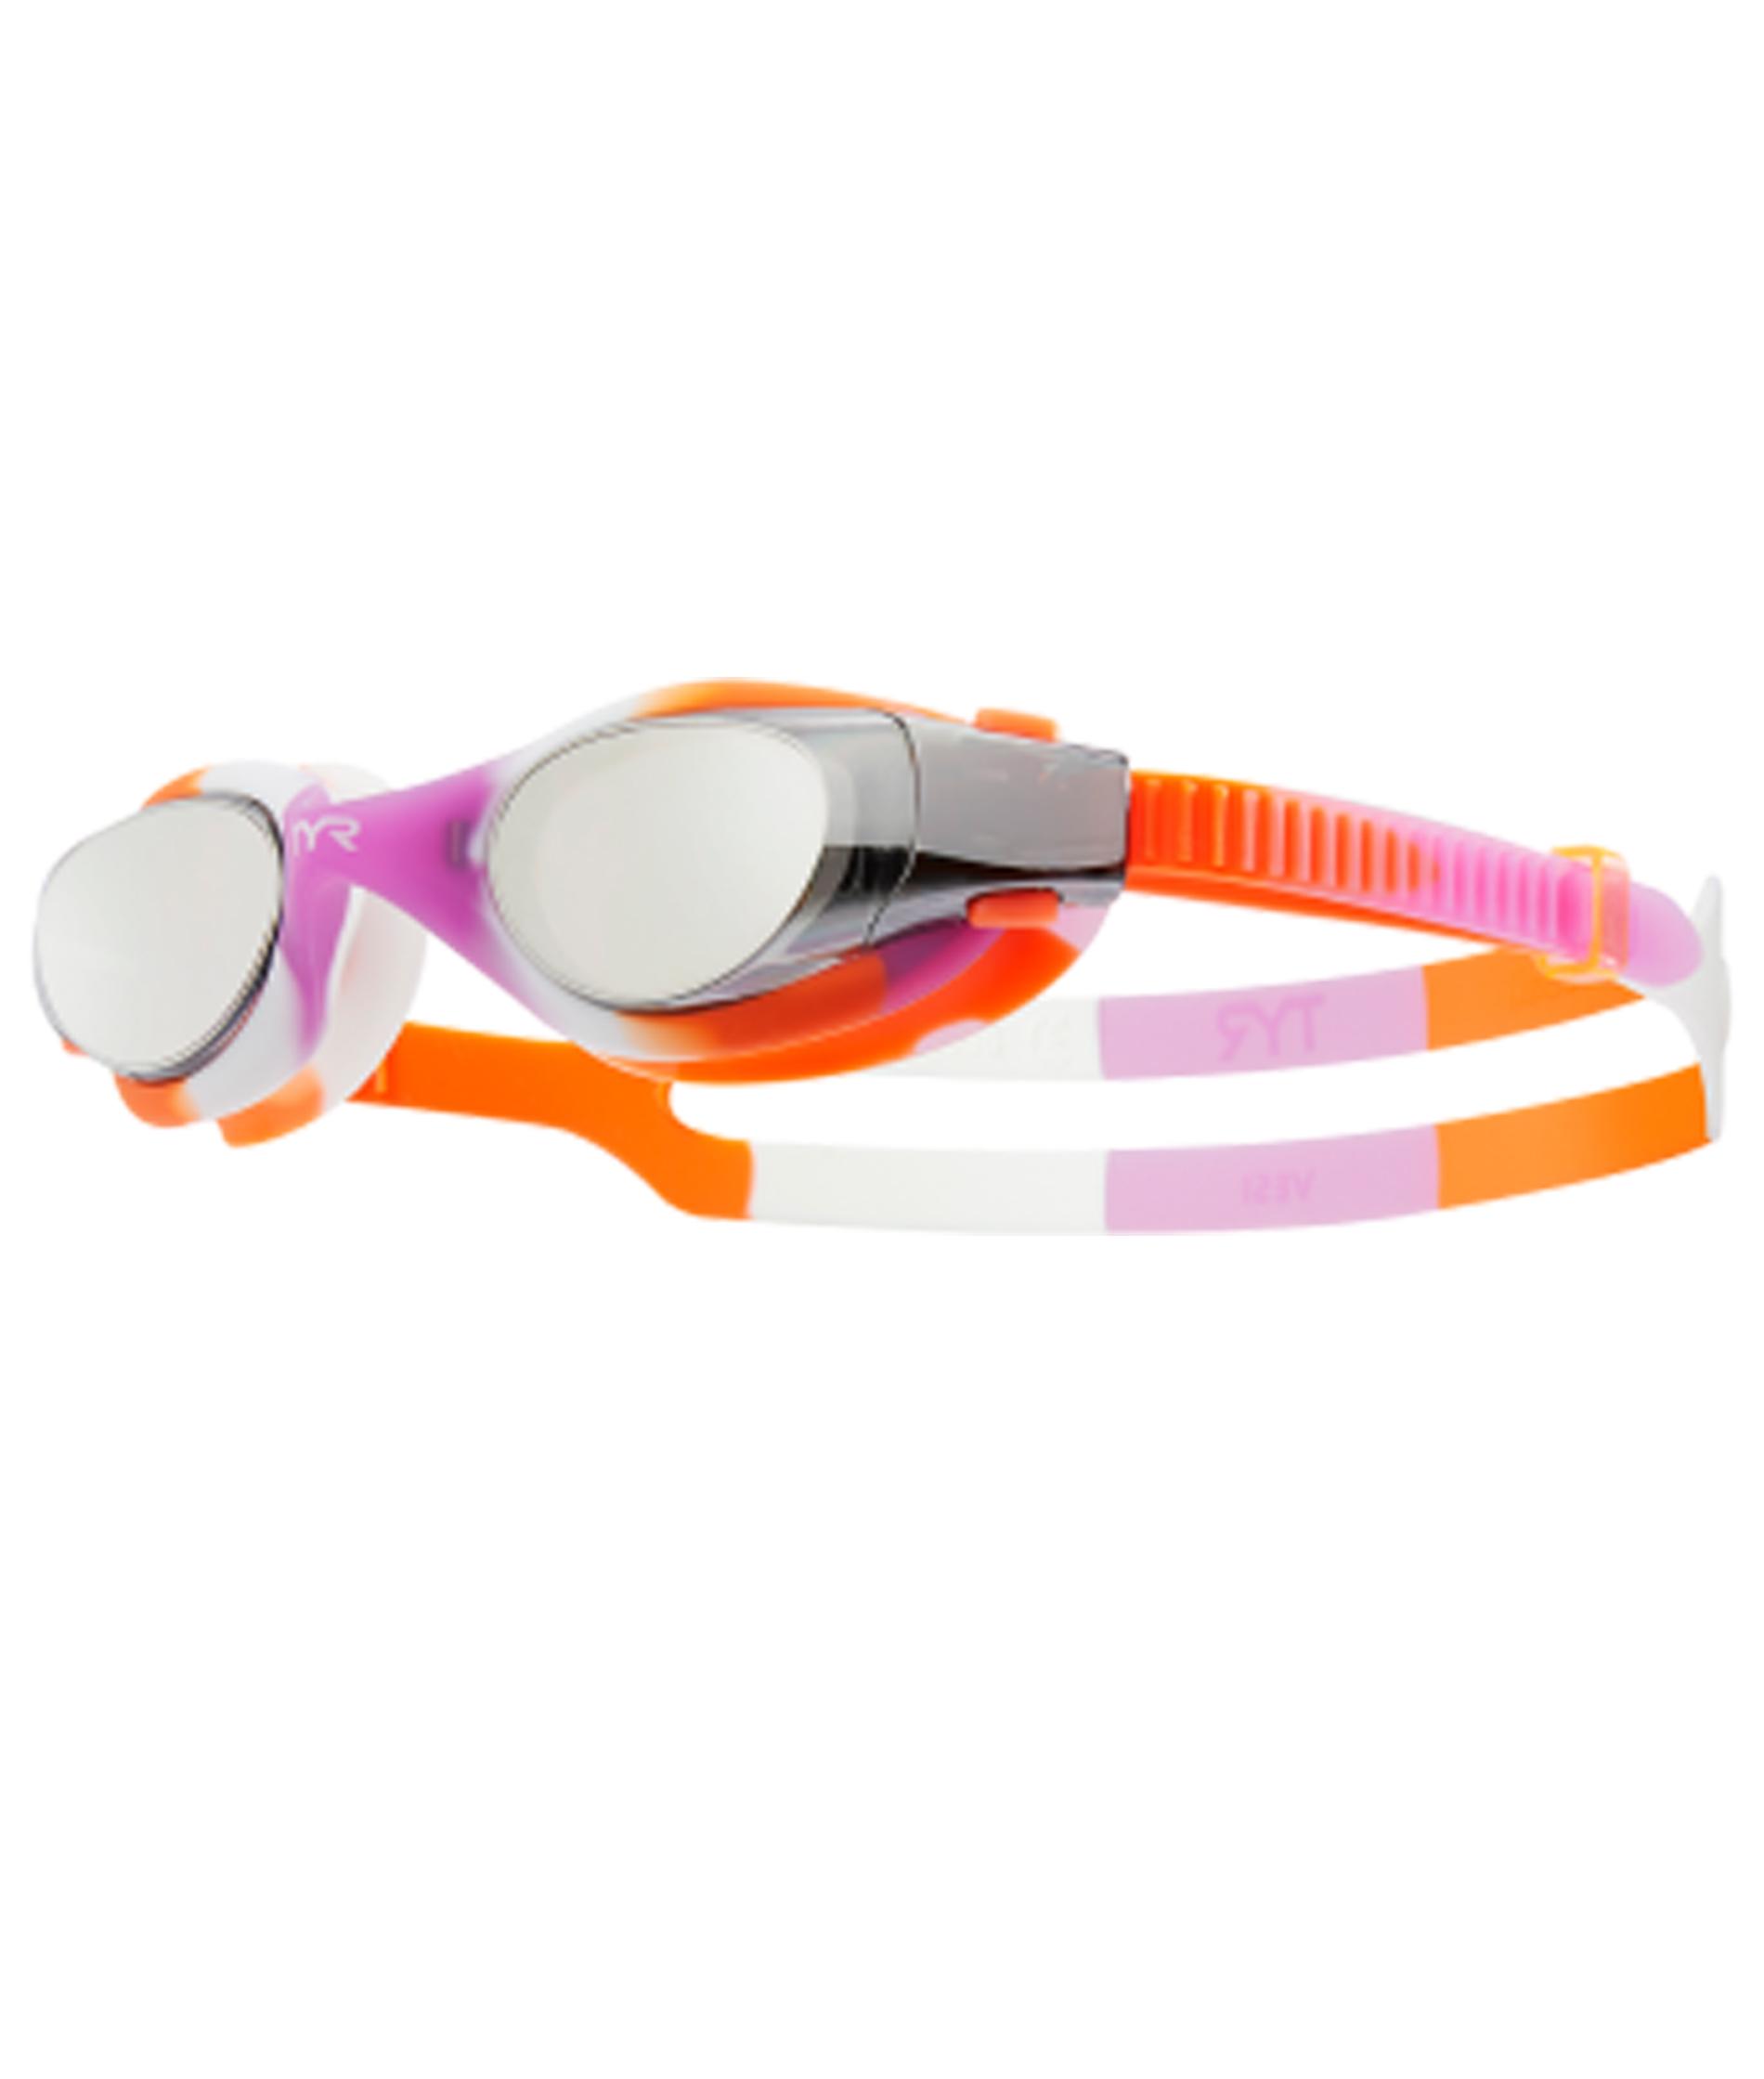 TYR Vesie Mirrored Youth Tie Dye Goggles - Orange/Purple/White